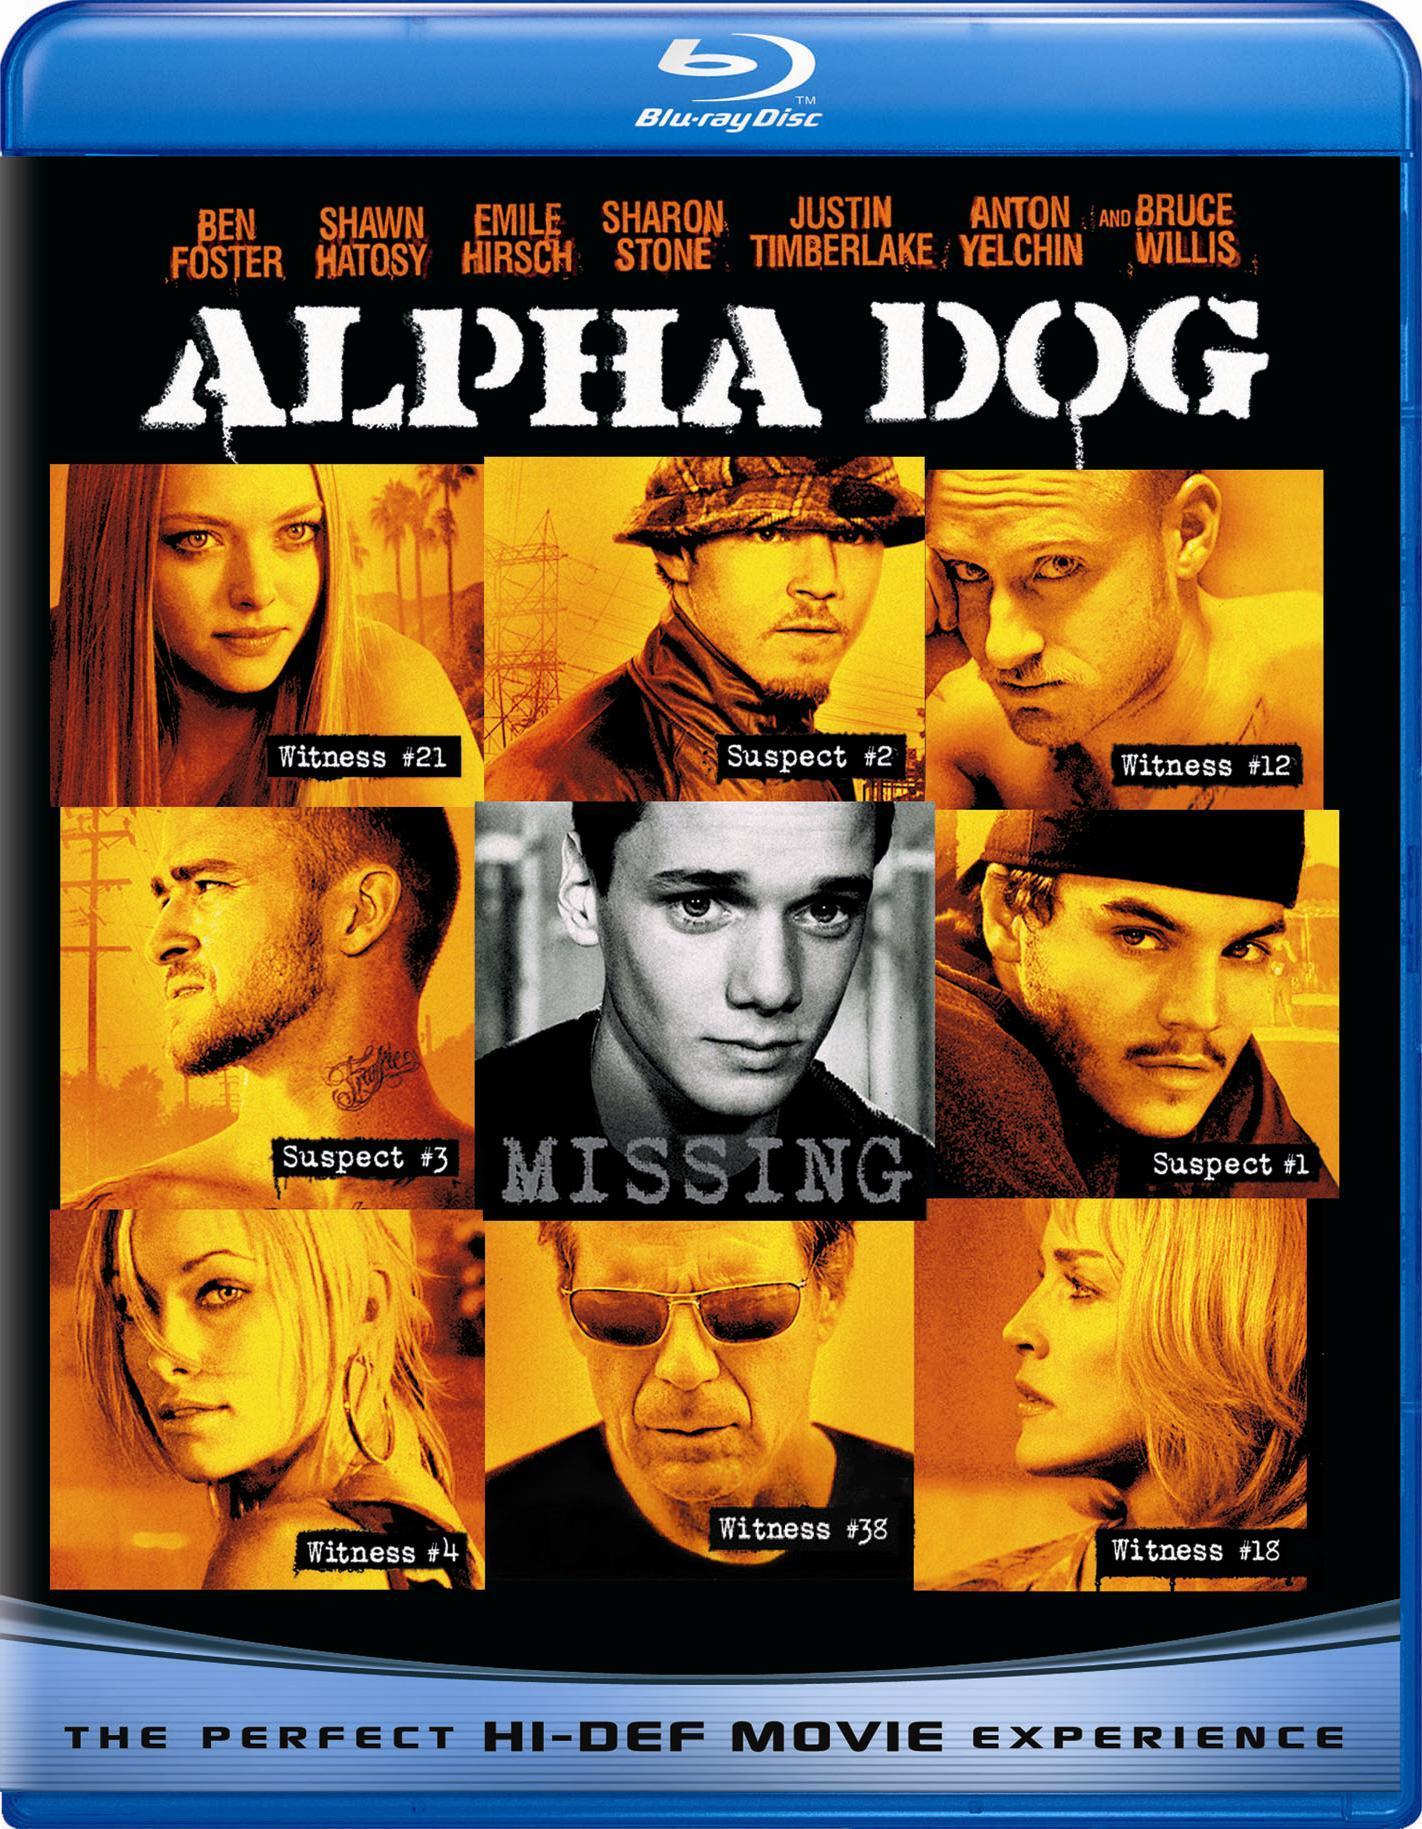 Alpha House 2014 Full Movie download alpha dog 2006 720p bluray h264 aac-rarbg - softarchive